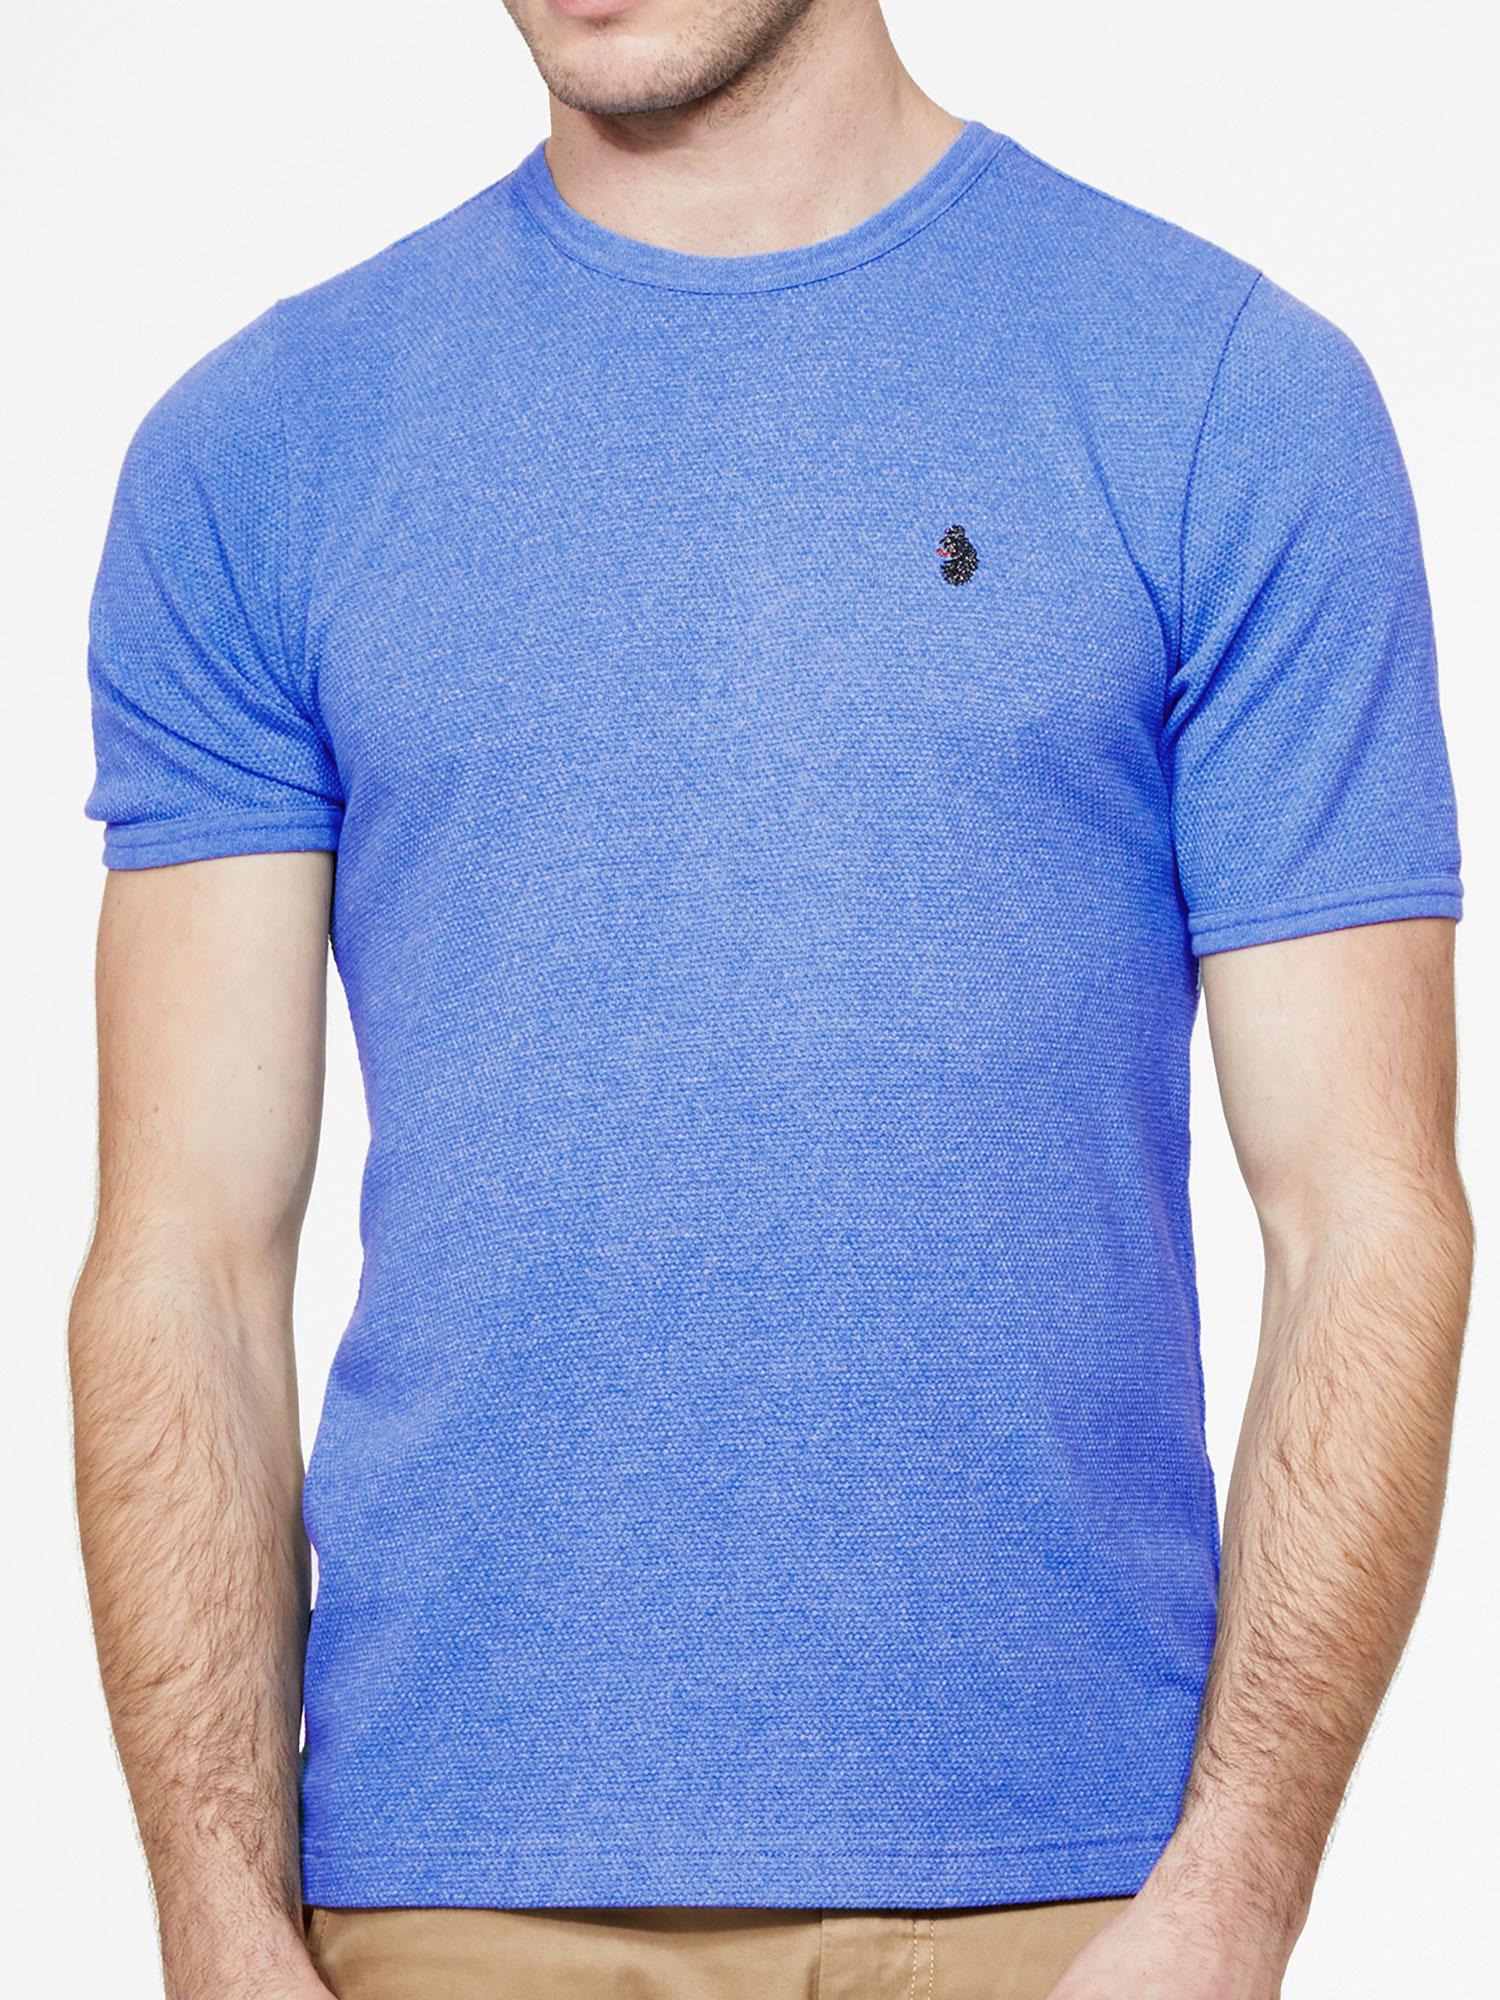 Luke-1977-uomo-pantaloni-SERPENTE-2-girocollo-Waffle-di-Marca-T-shirt